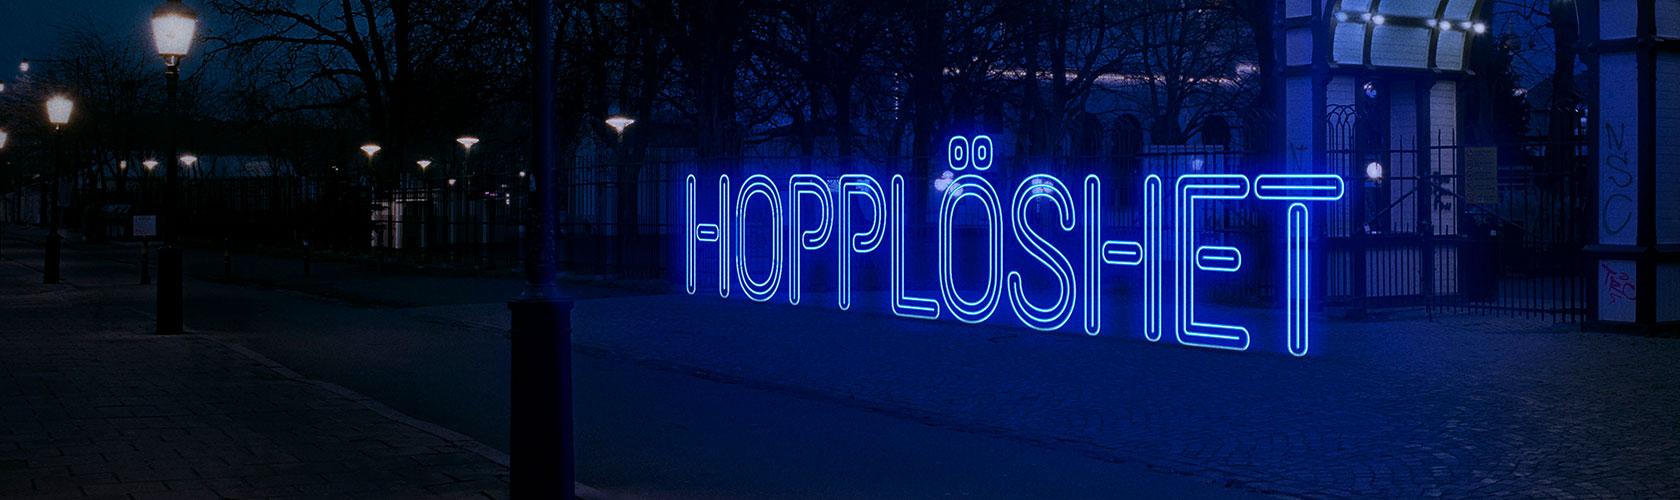 Känner du hopplöshet? Prata om det på Mind Forum